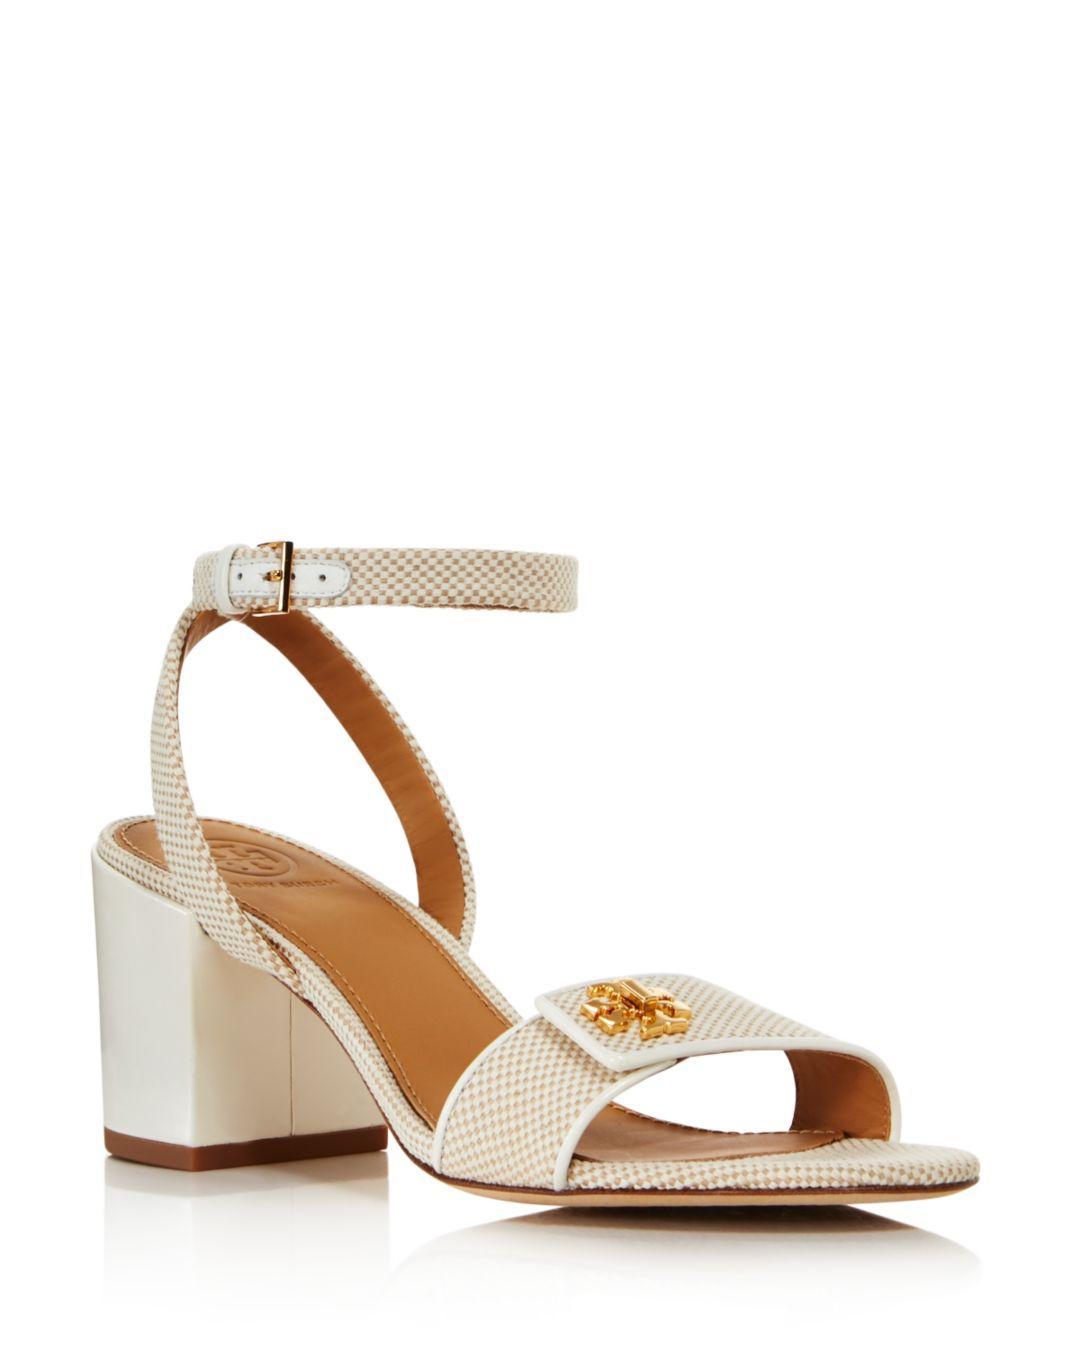 ecf3eab24fb055 Lyst - Tory Burch Women s Kira Block Heel Sandals in Natural